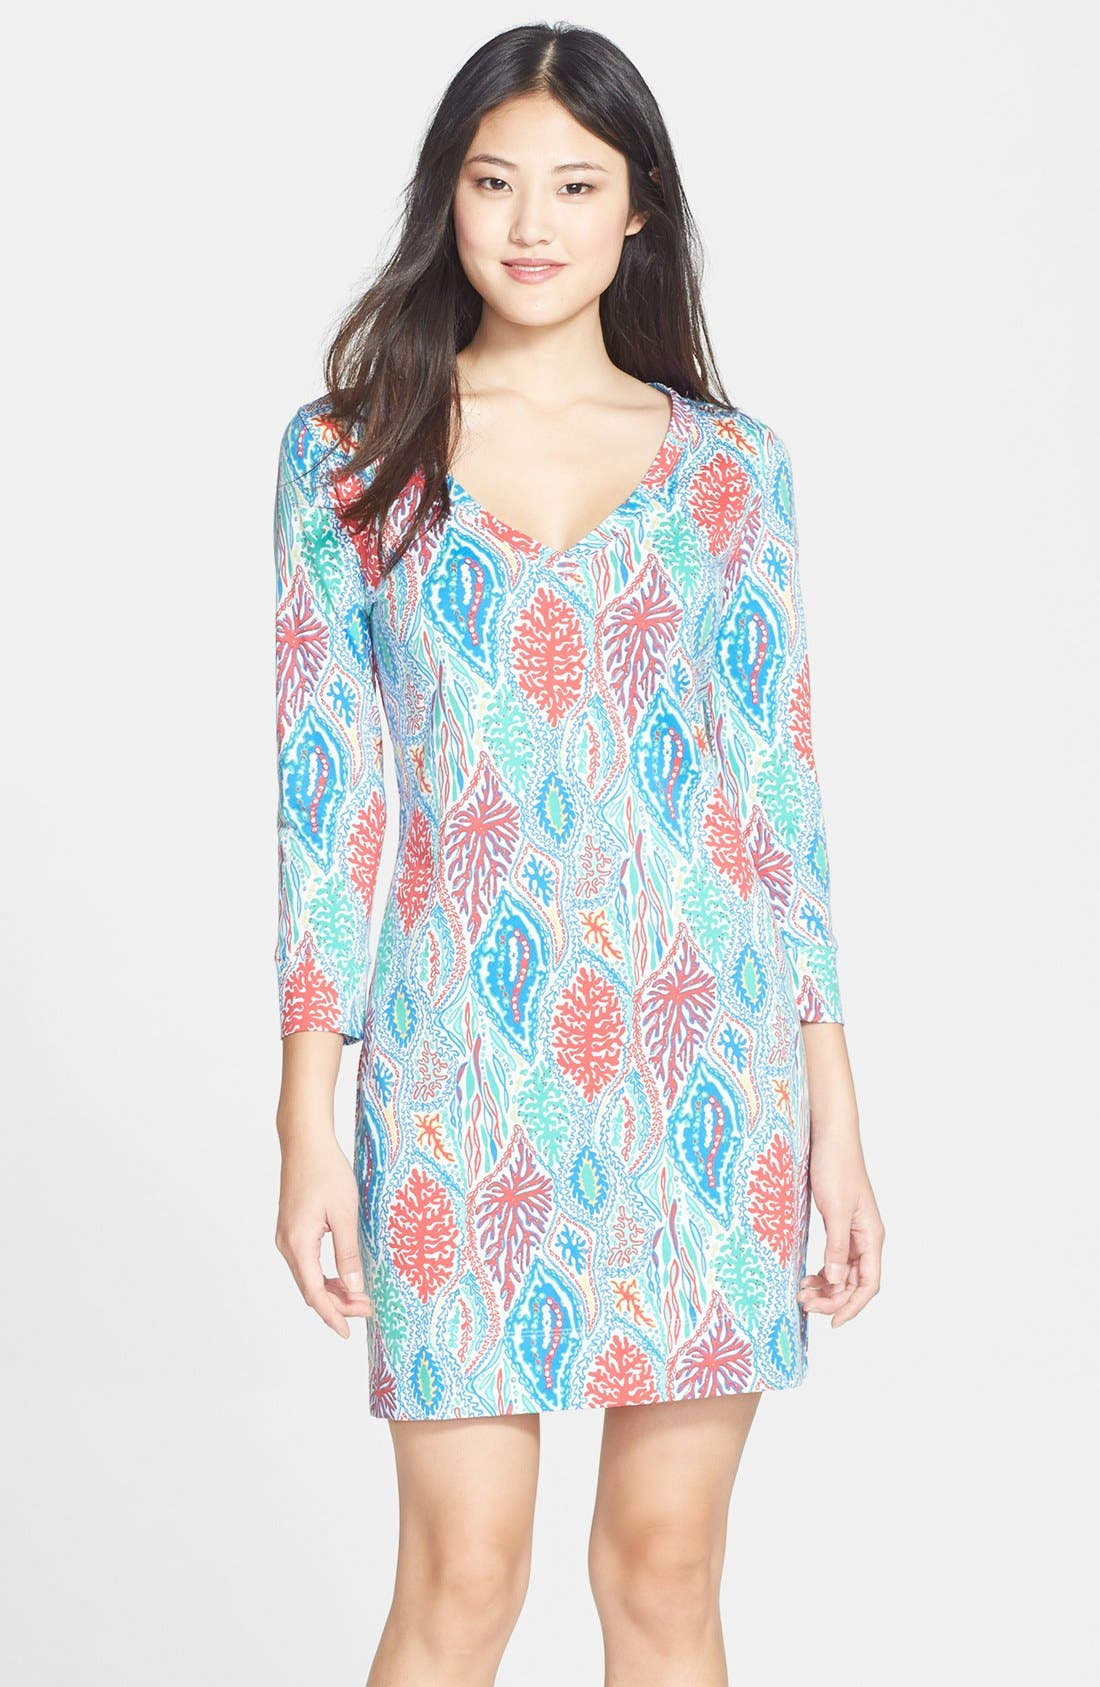 Main Image - Lilly Pulitzer® 'Christie' Print V-Neck Shift Dress